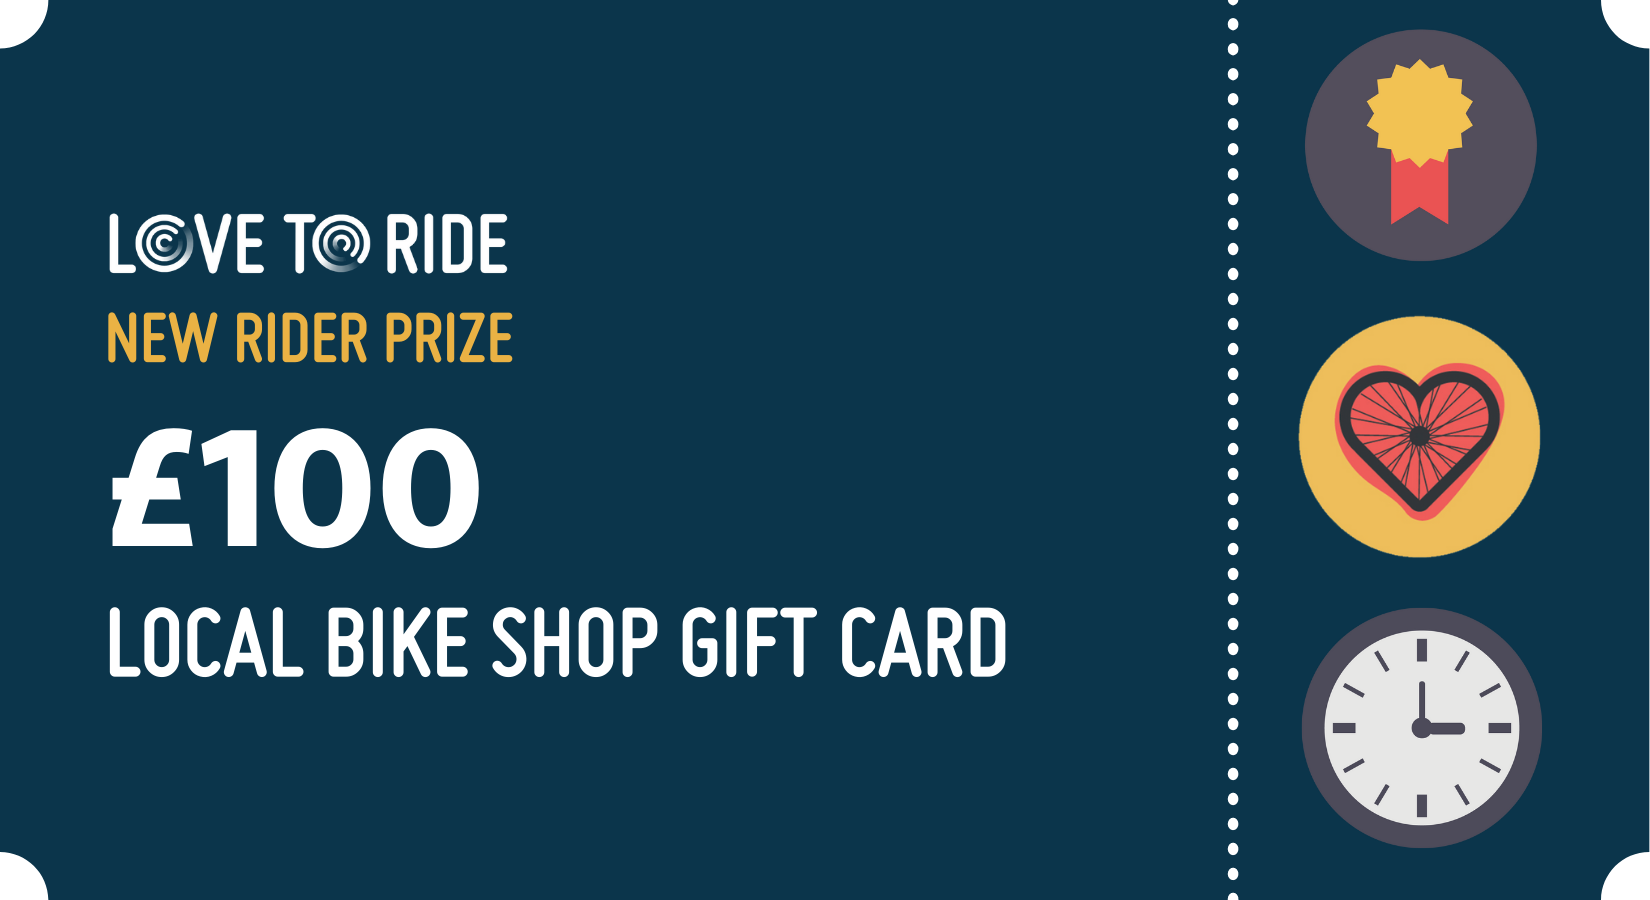 A local bike shop gift card design. The text says 'Pre-registration prize. £100 local bike shop gift card'